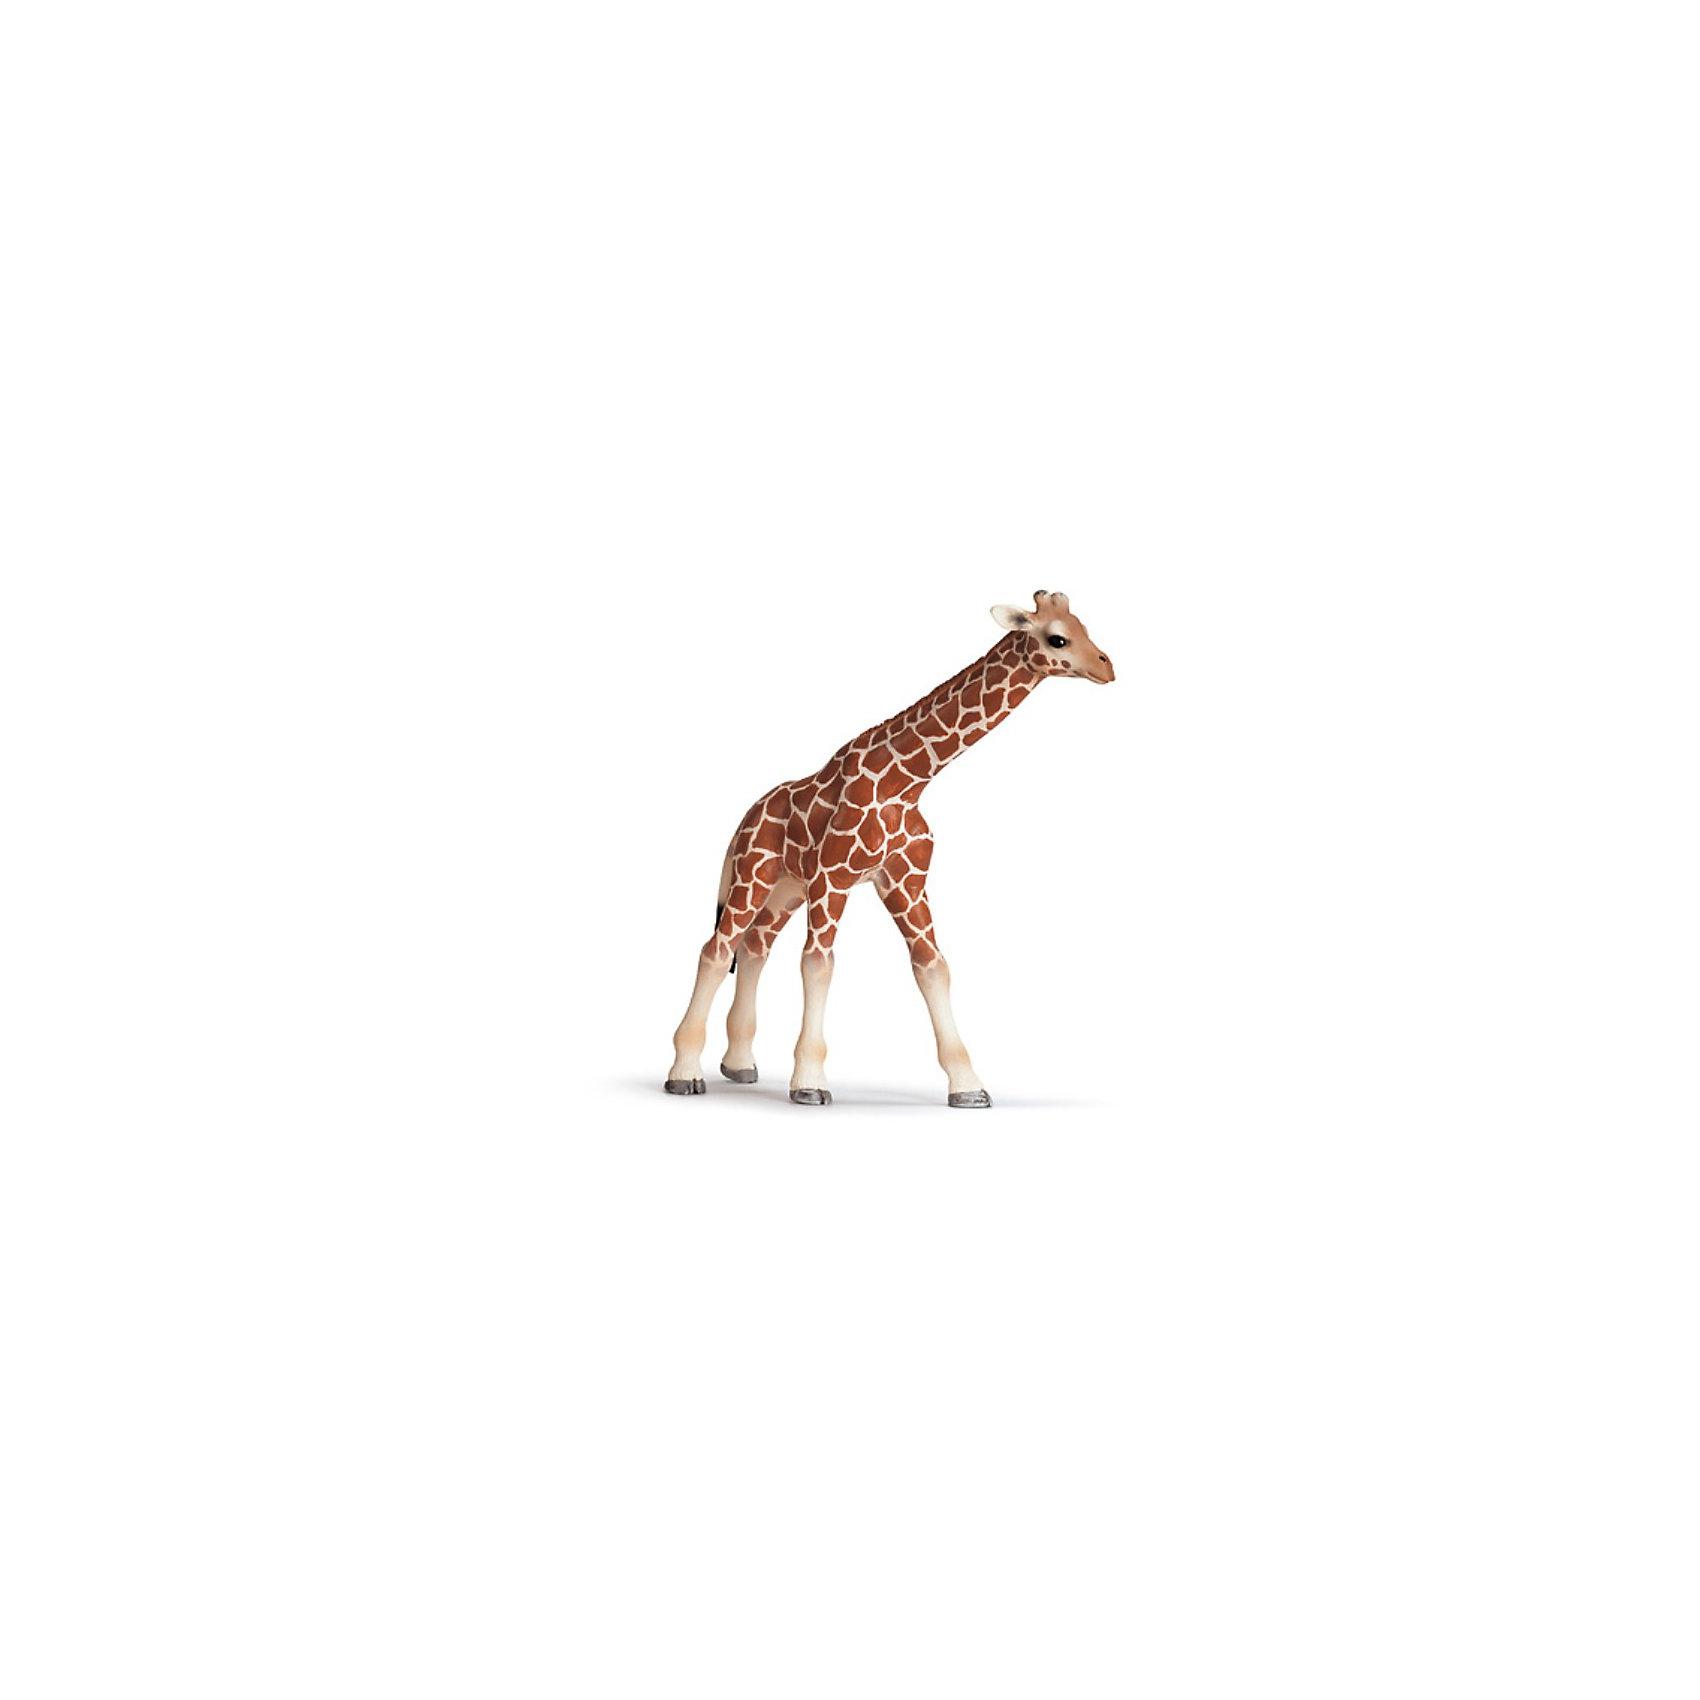 Schleich Schleich Детеныш жирафа. Серия Дикие животные животные серия антистресс альбом